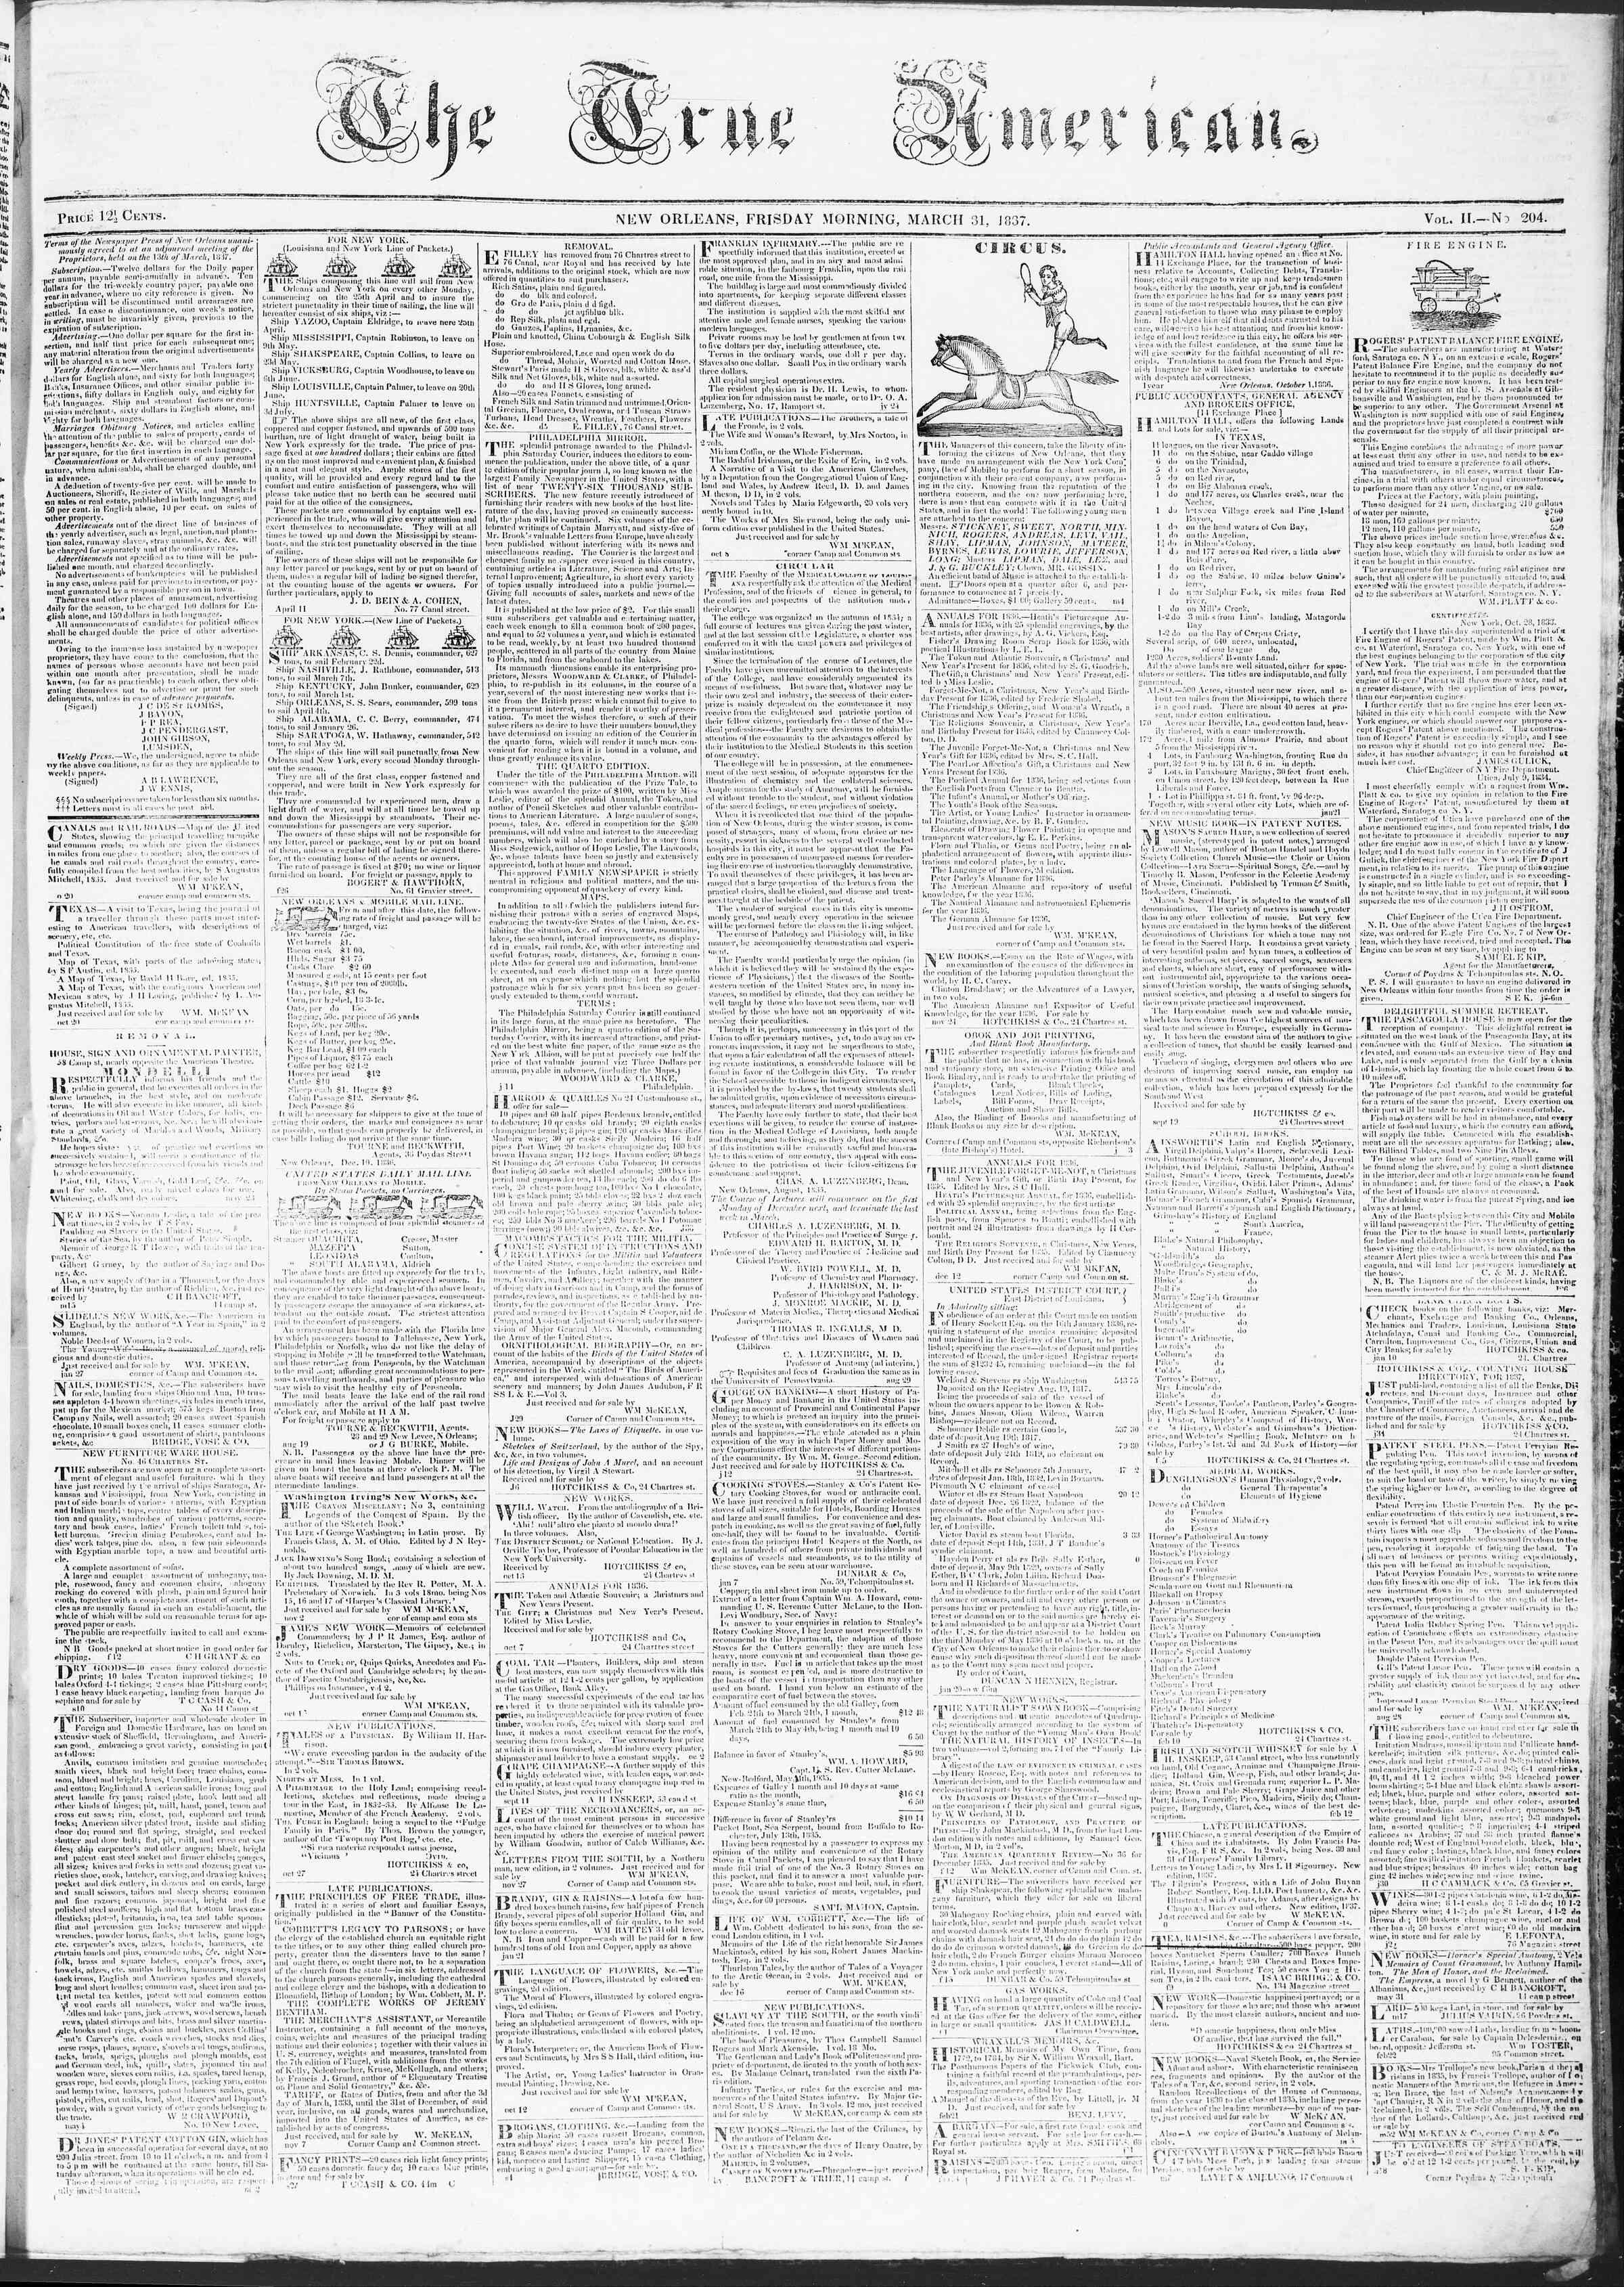 March 31, 1837 Tarihli True American Gazetesi Sayfa 1